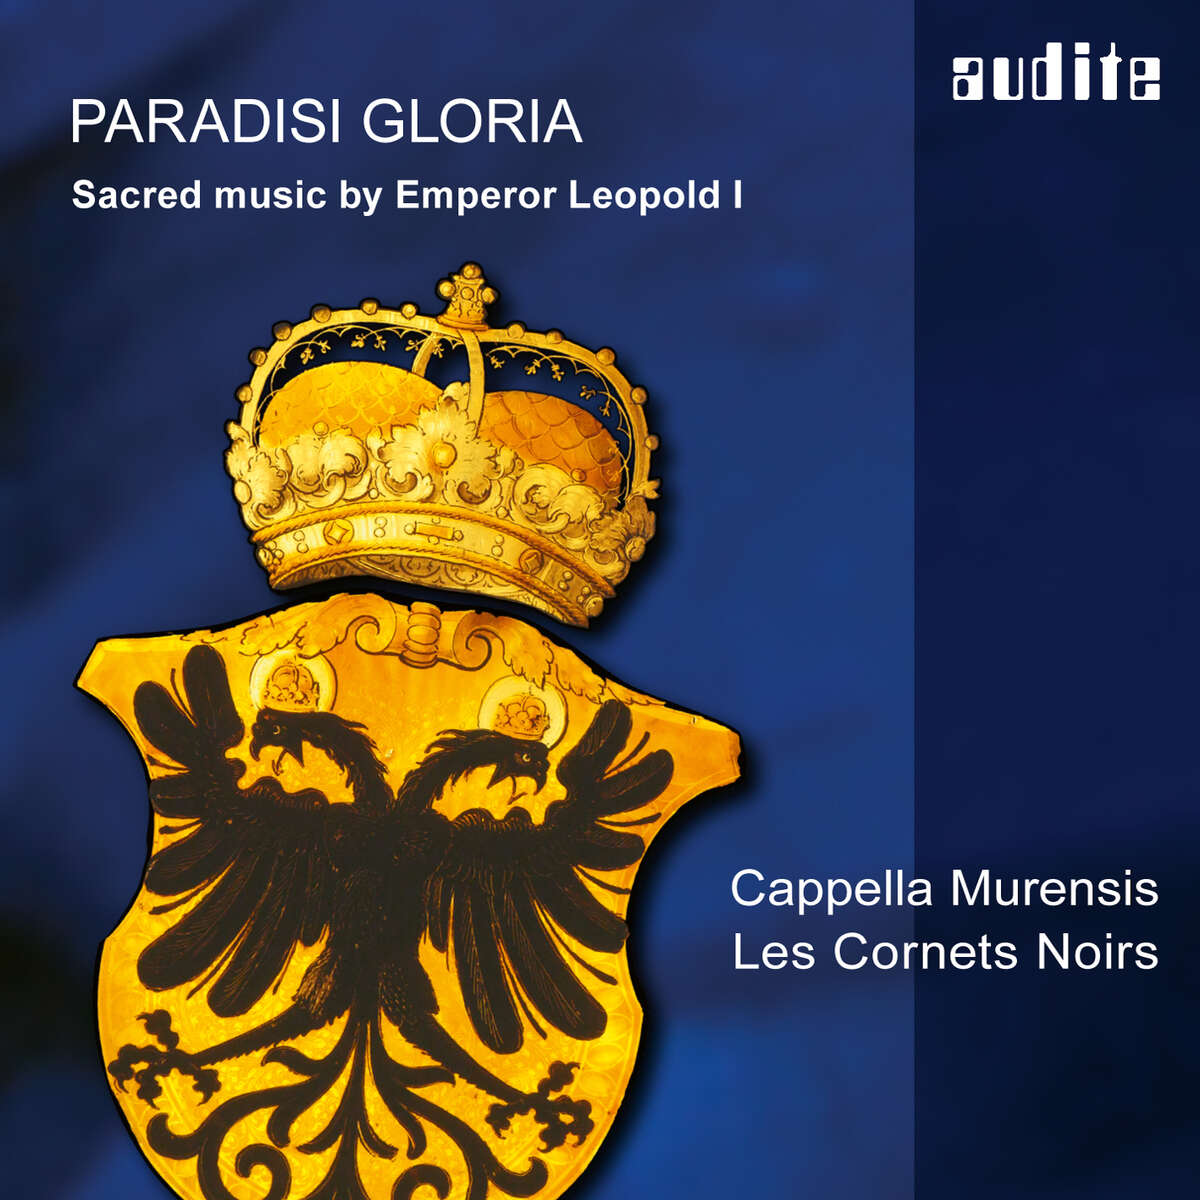 Paradisi Gloria - Sacred music by Emperor Leopold I